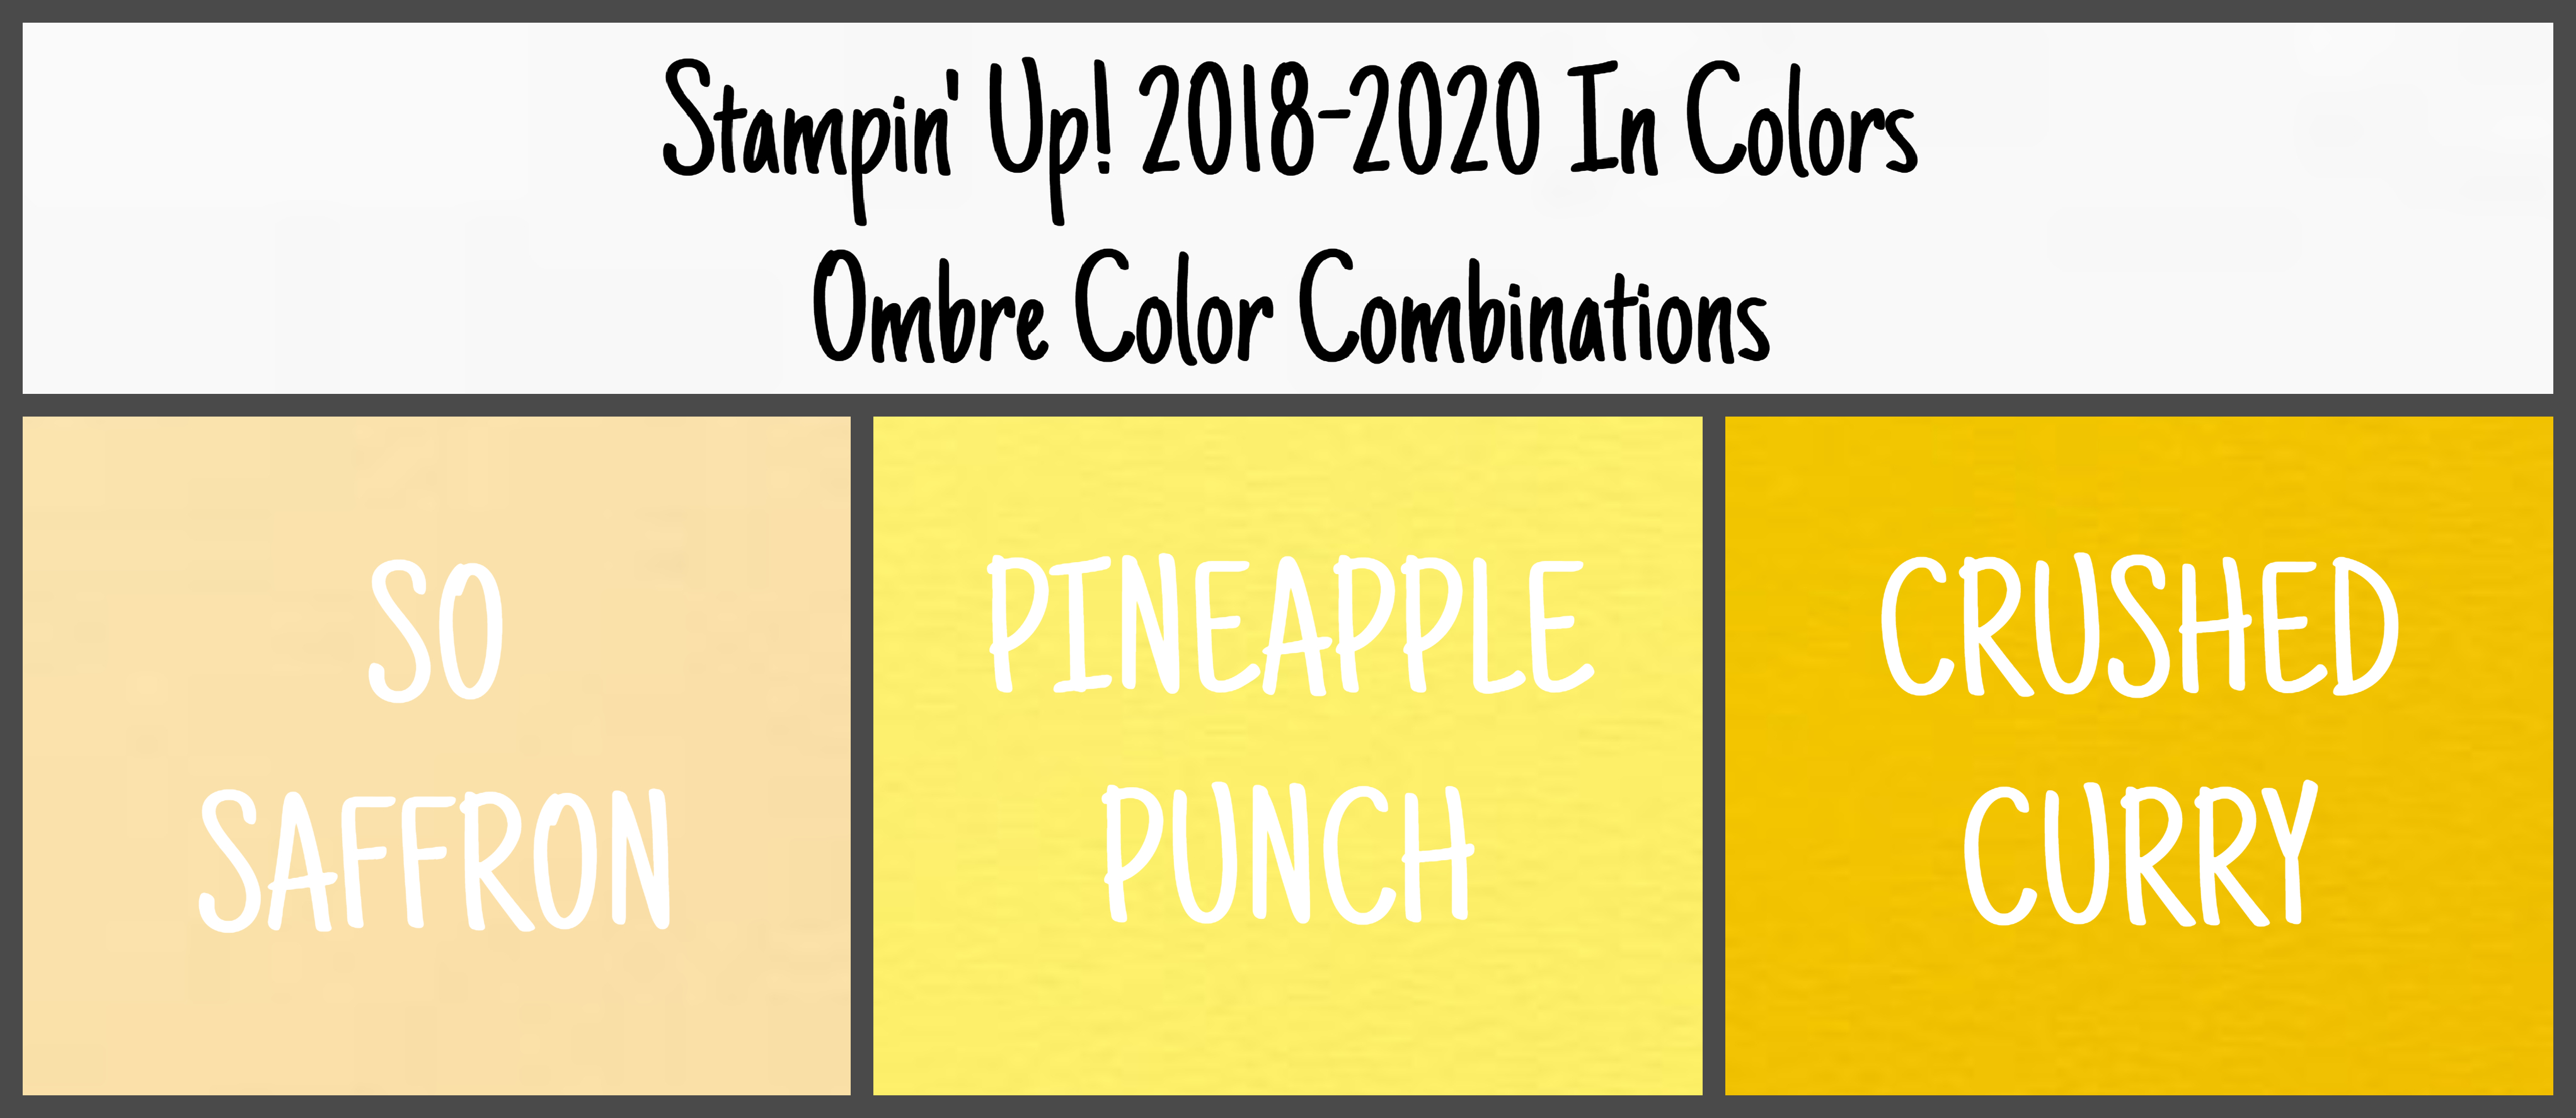 Pineapple Punch | kelly kent